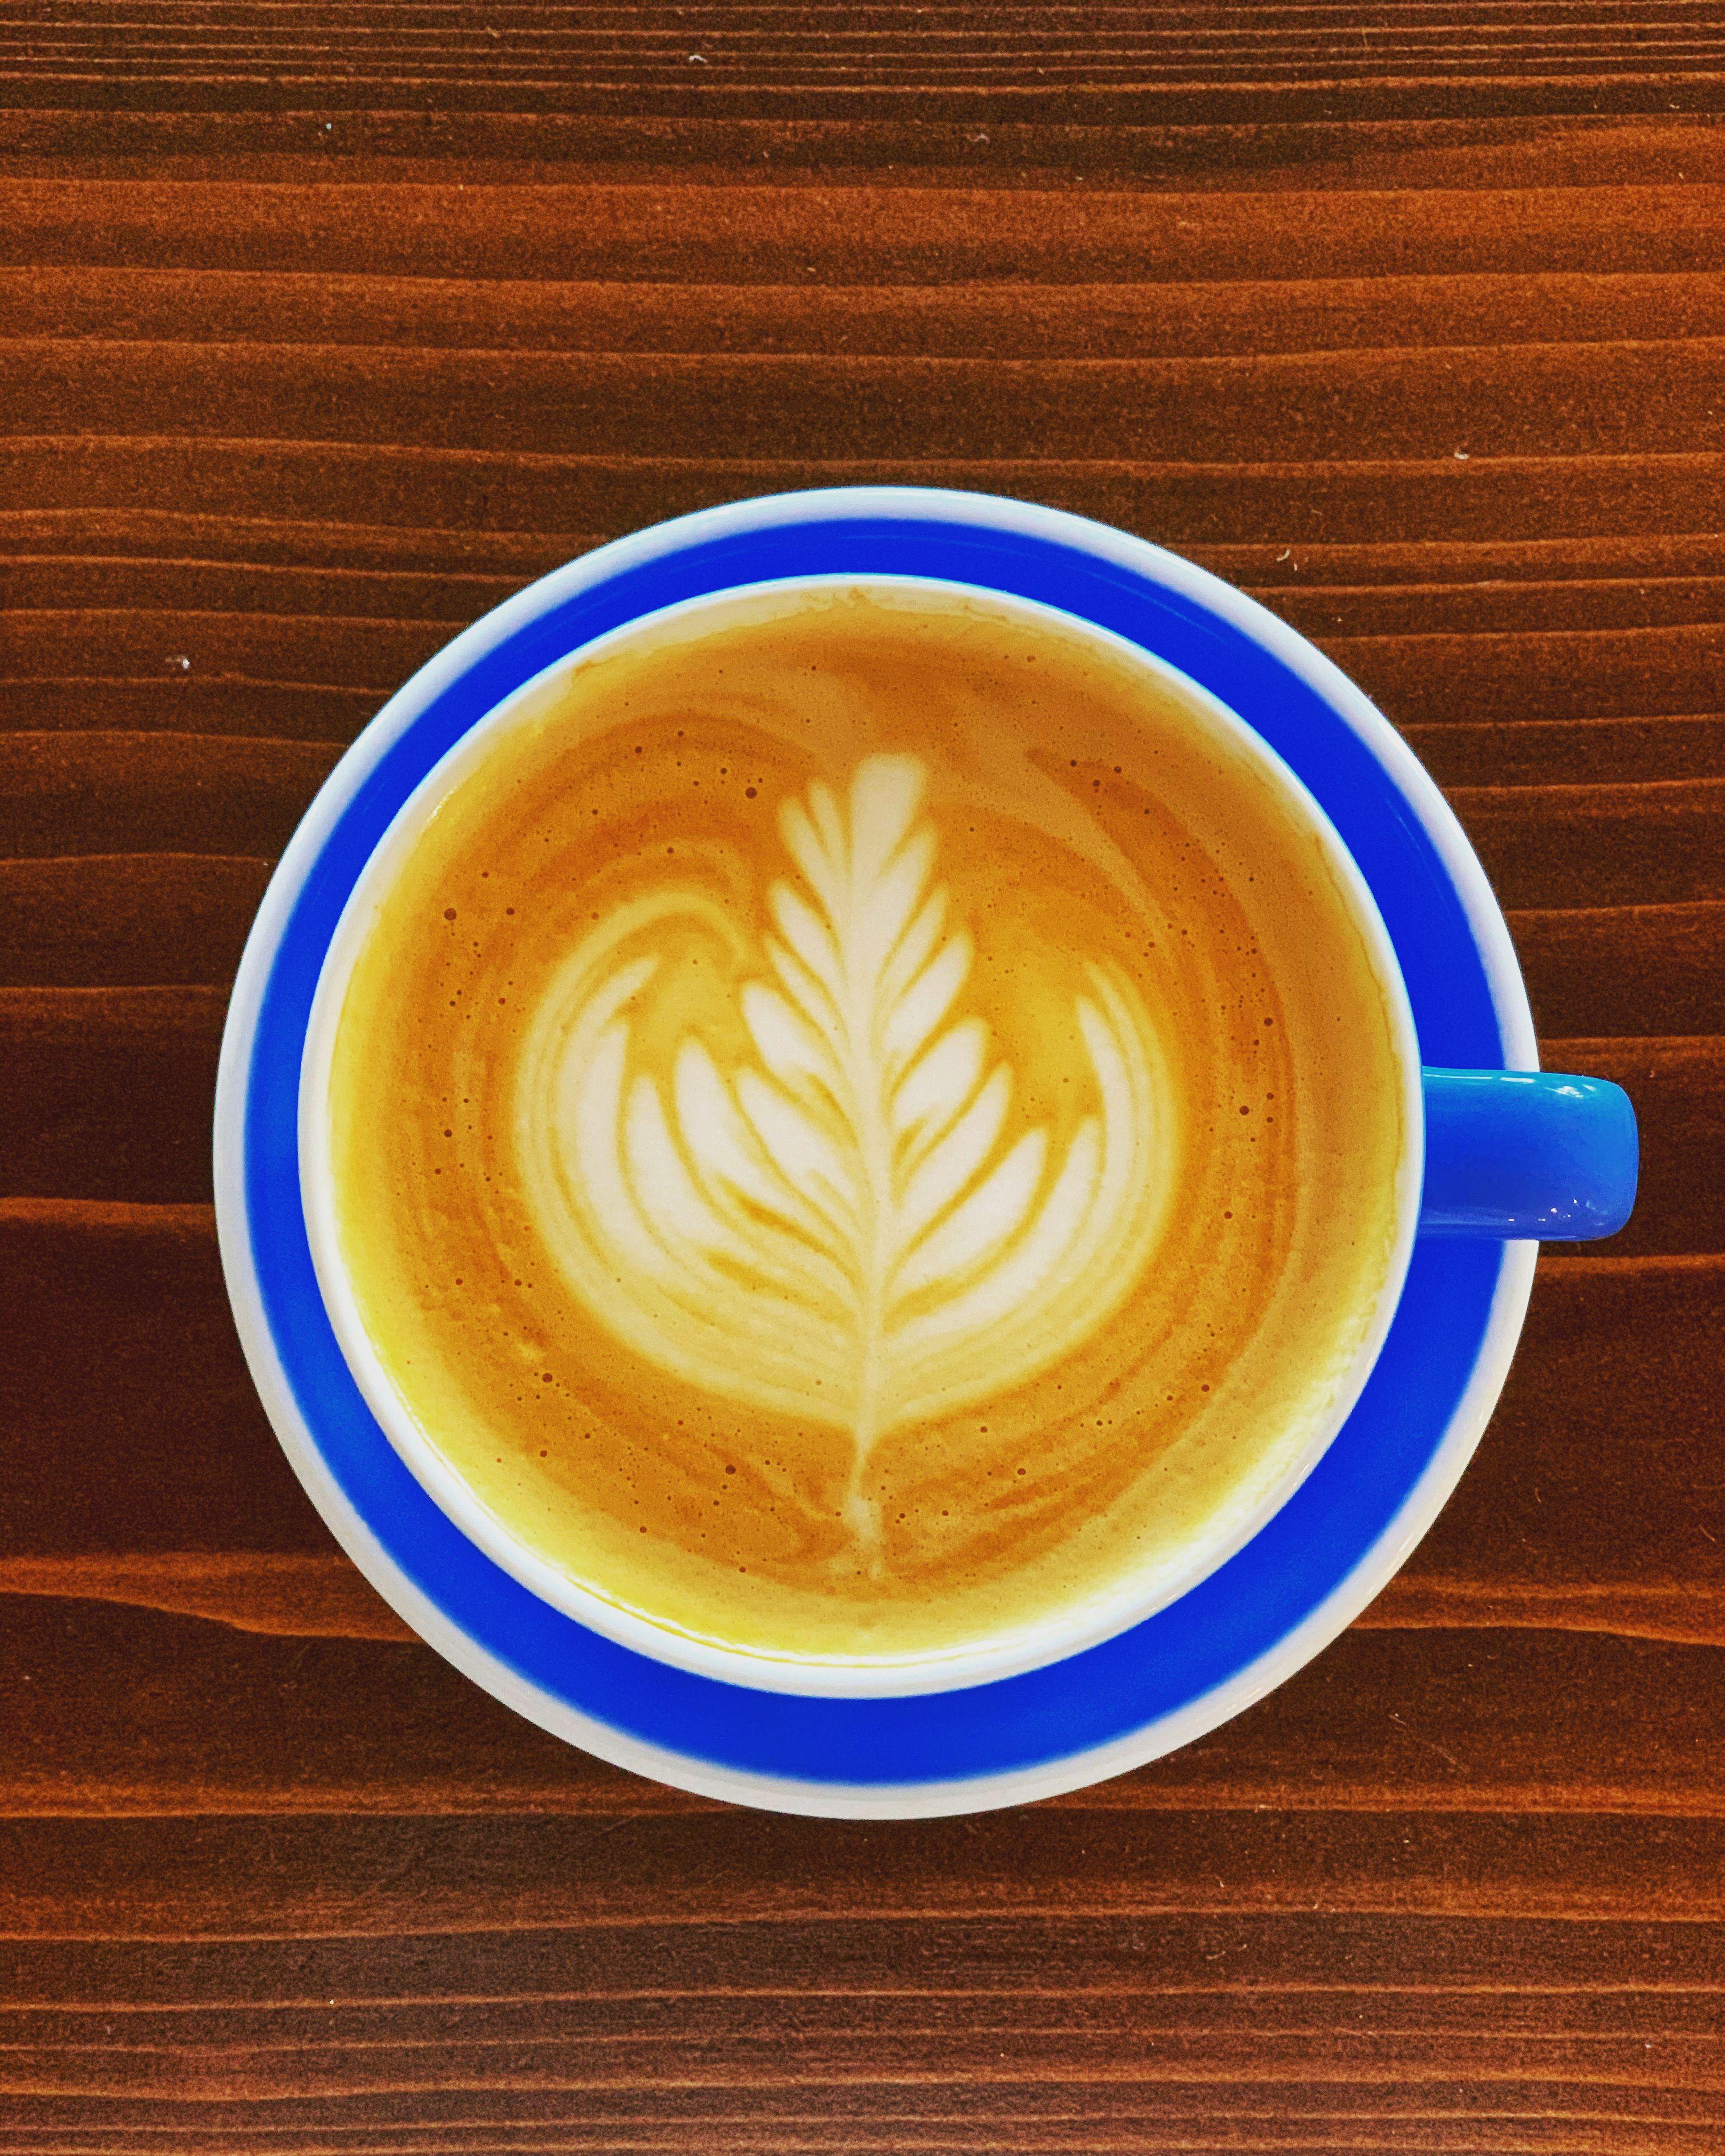 Caffeinate in style in 2020 in 2020 best